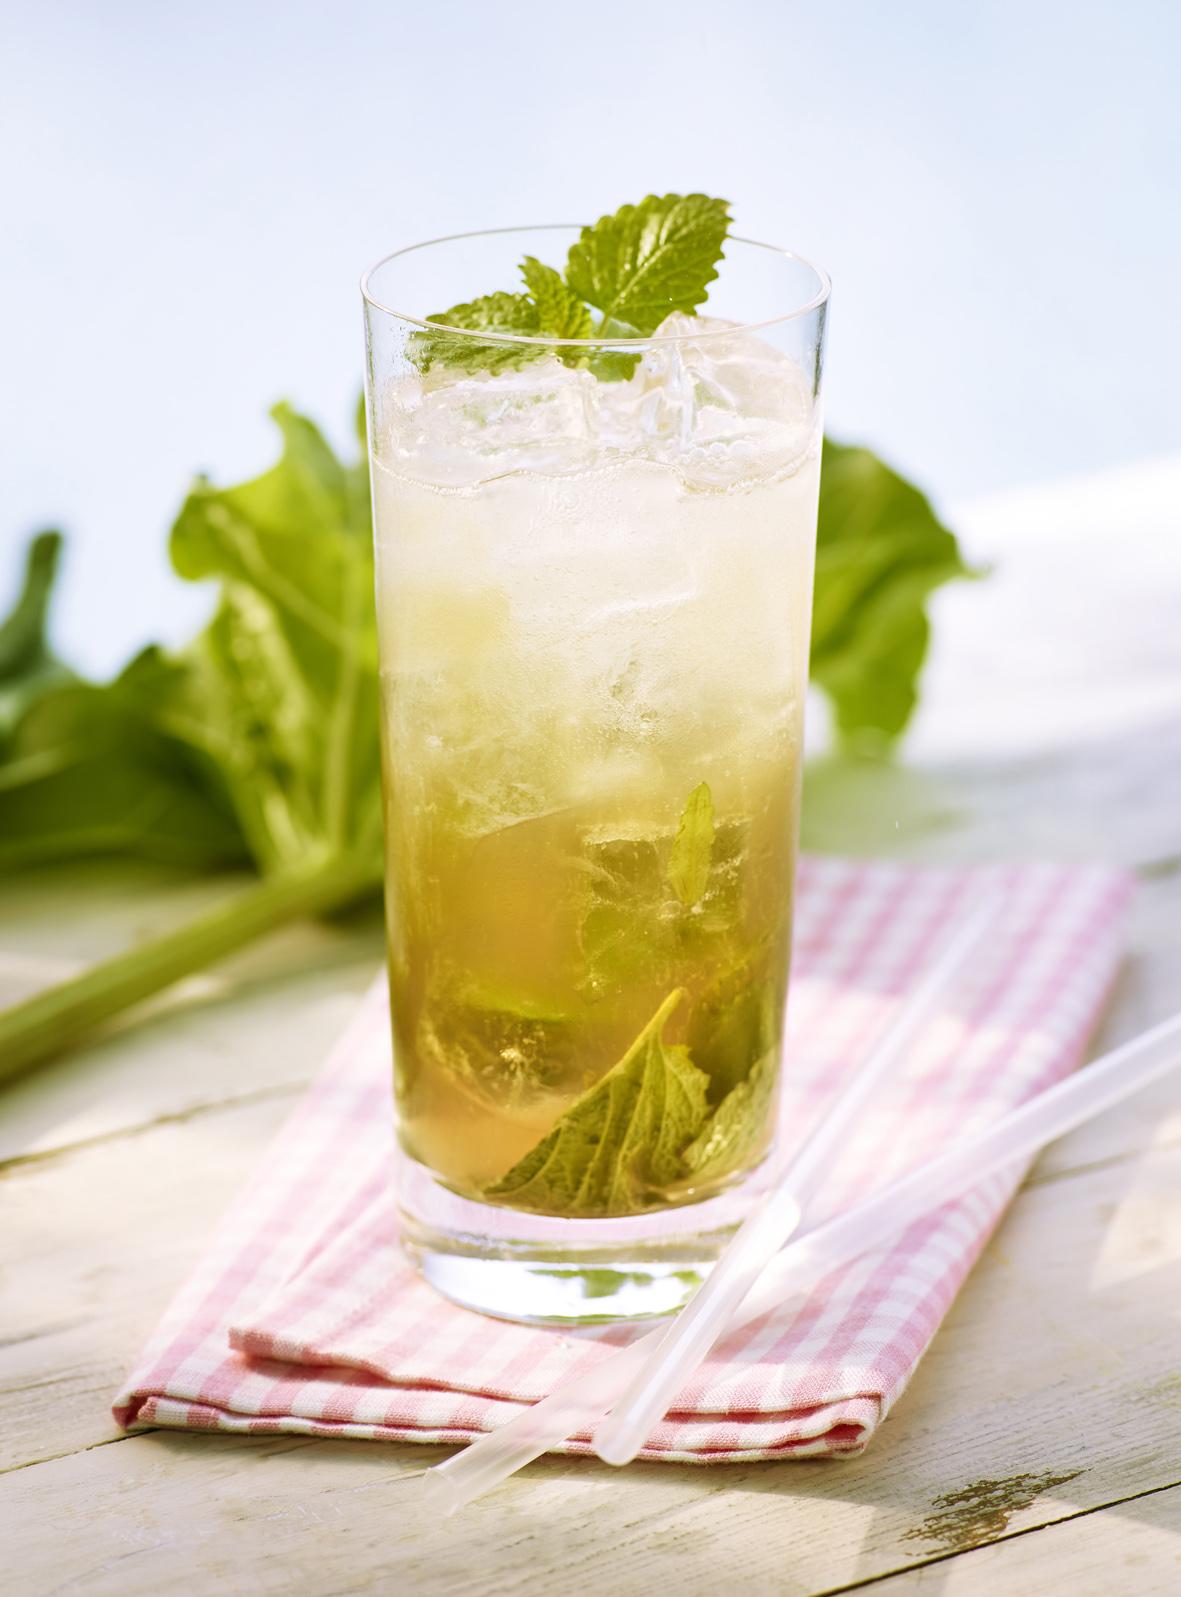 Dieses Getränk hilft gegen Kater 2